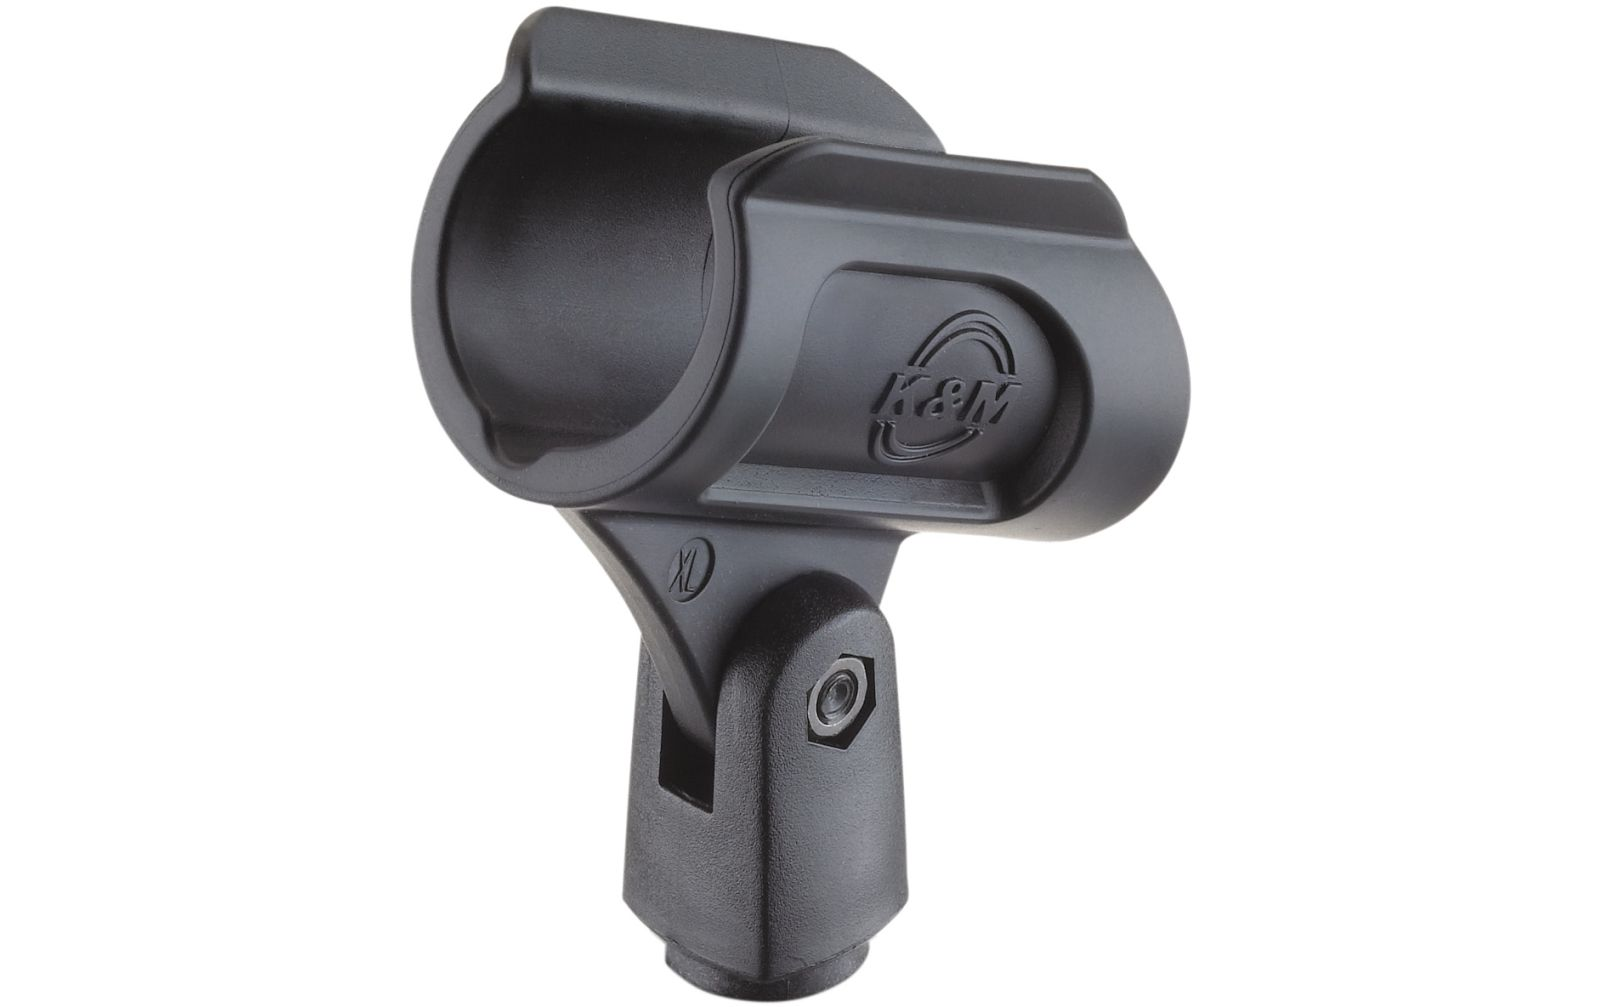 k-m-85070-500-mikrofonklammer